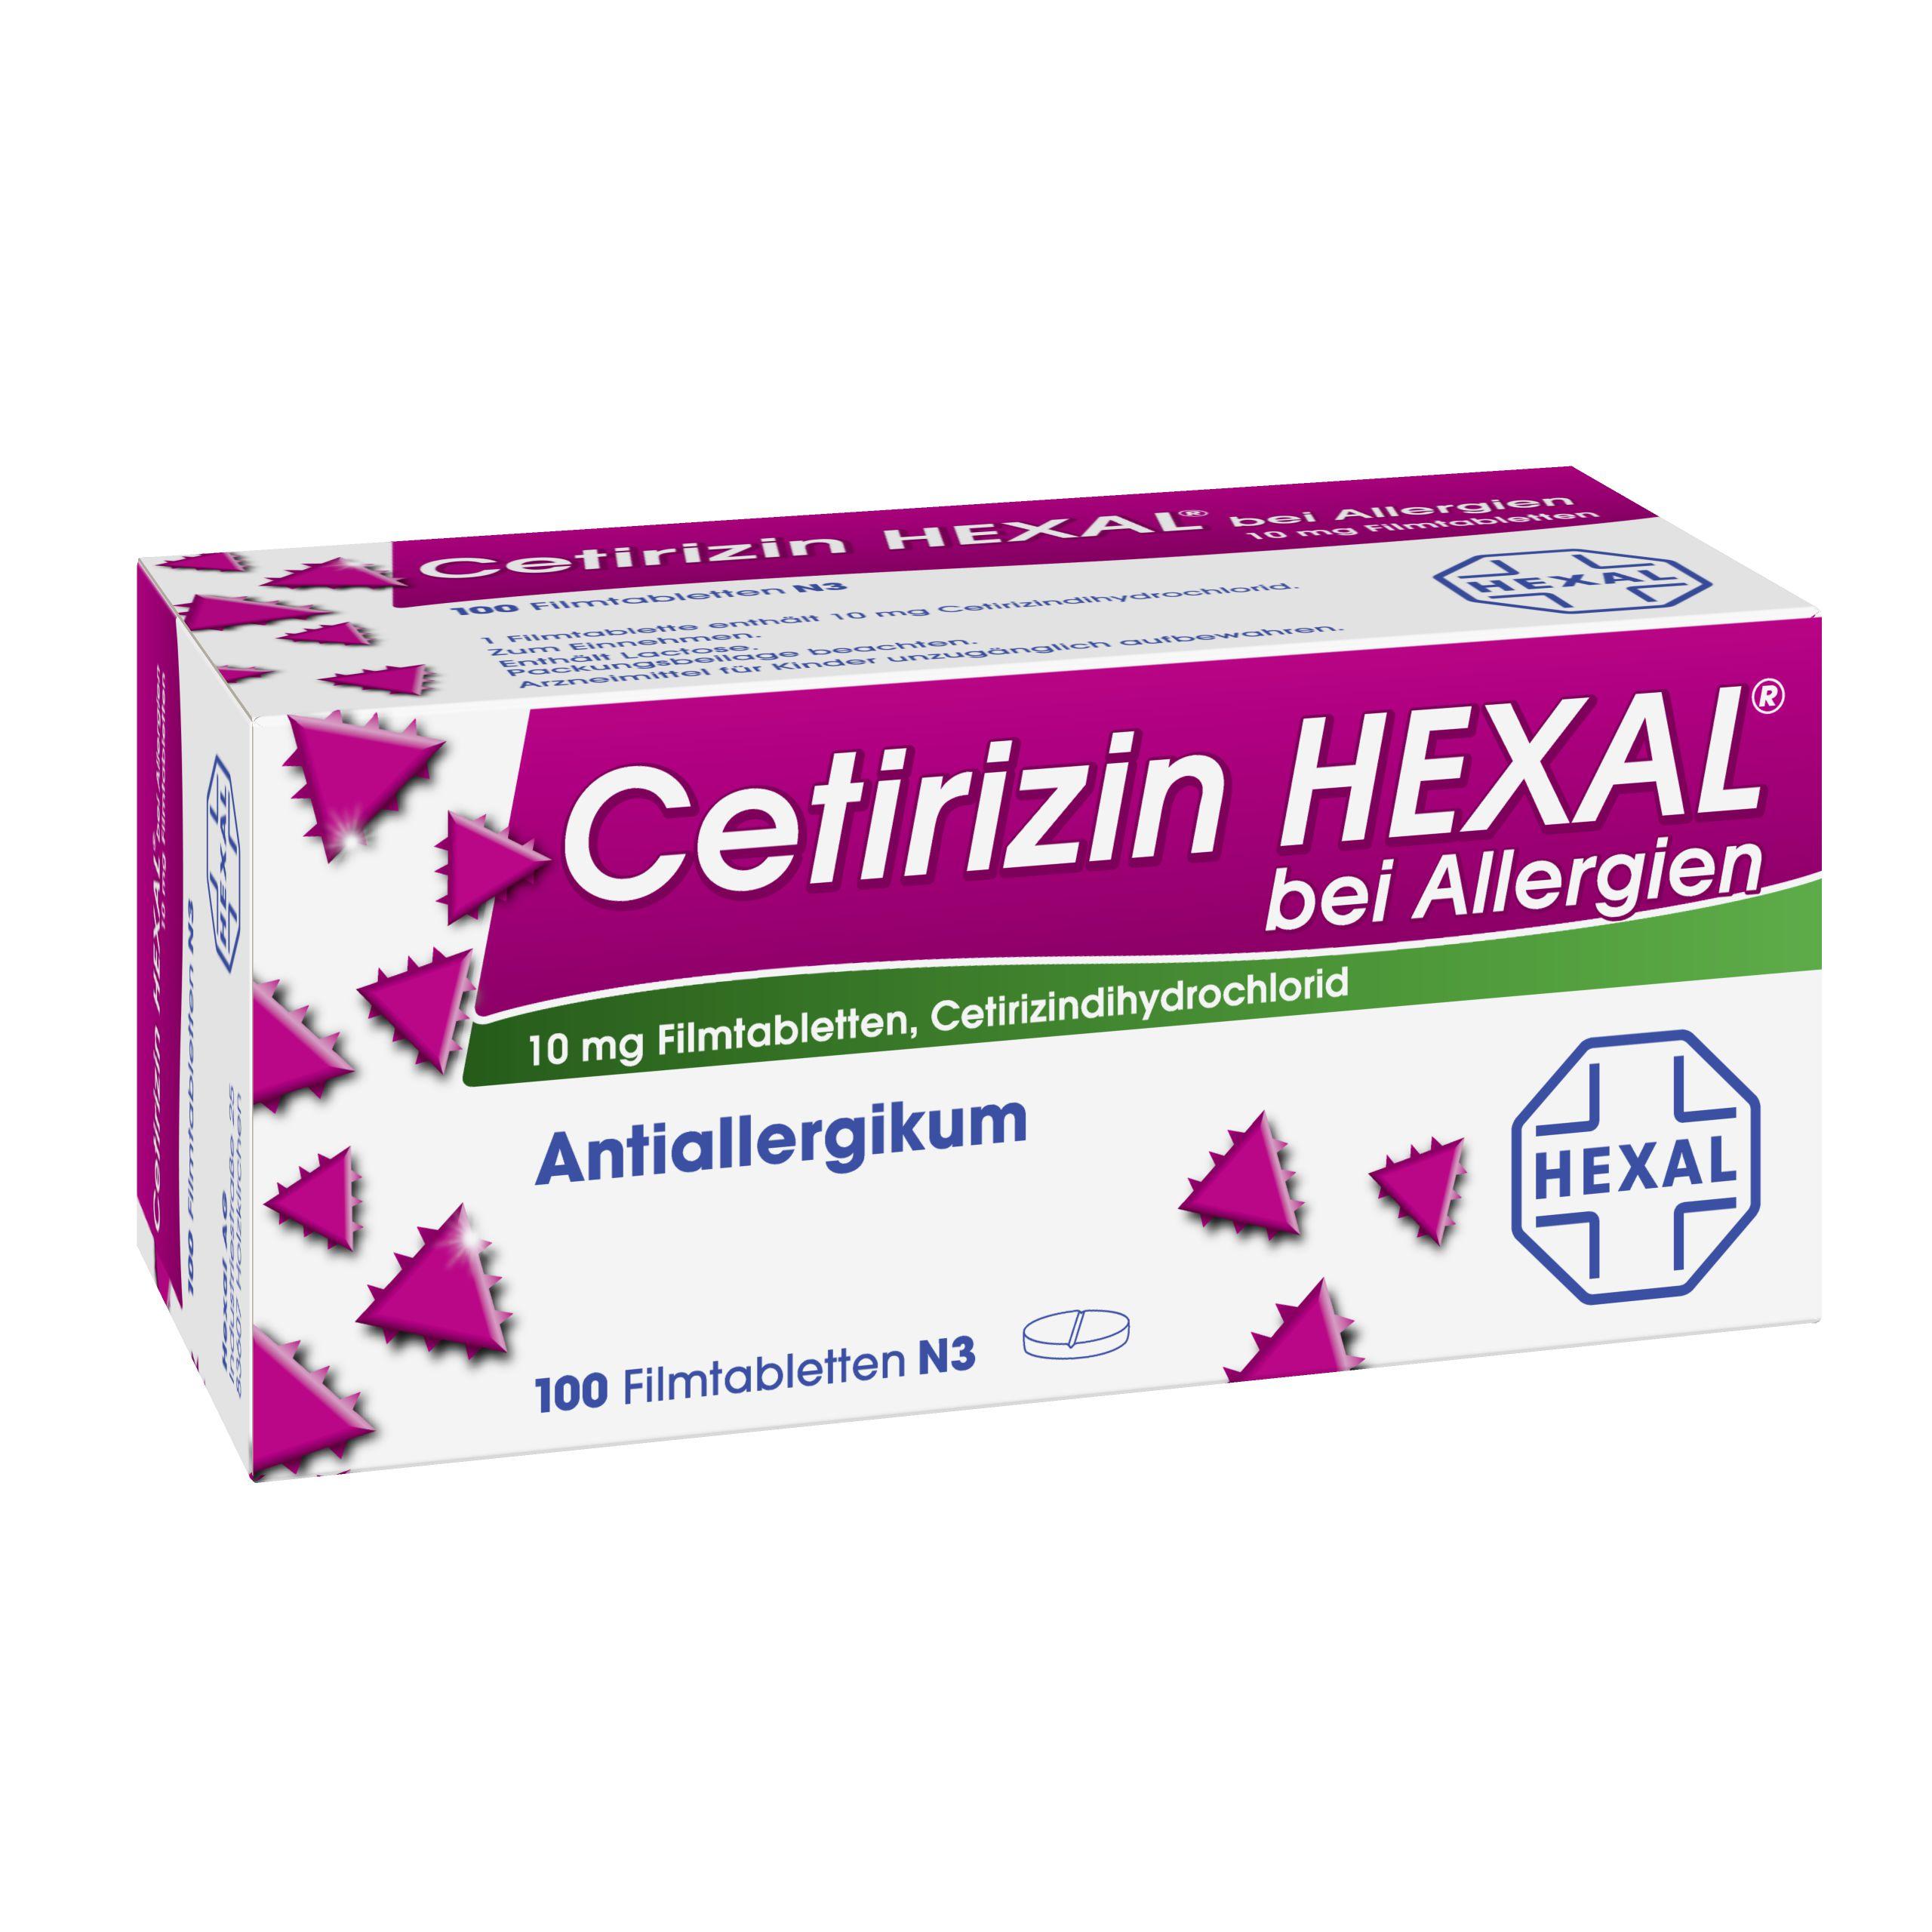 cetirizin hexal bei allergien 10 mg filmtabletten shop. Black Bedroom Furniture Sets. Home Design Ideas